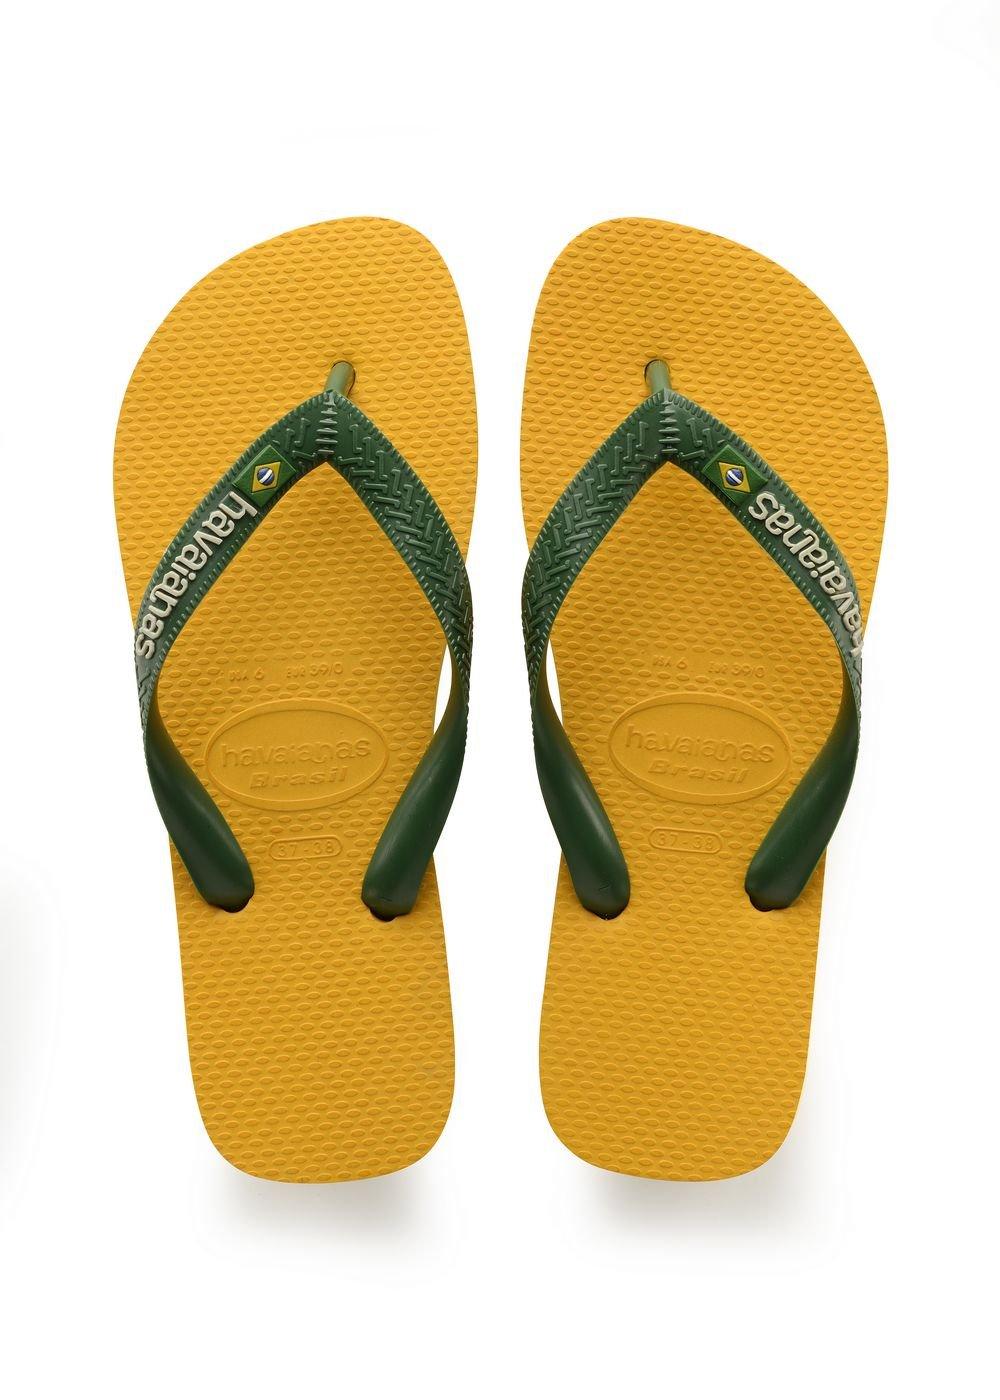 fde616ec393f Galleon - Havaianas Unisex Brasil Logo Rubber Flip-Flops Banana Yellow Size  EU 39 40 - Bra 37 38 - US M6